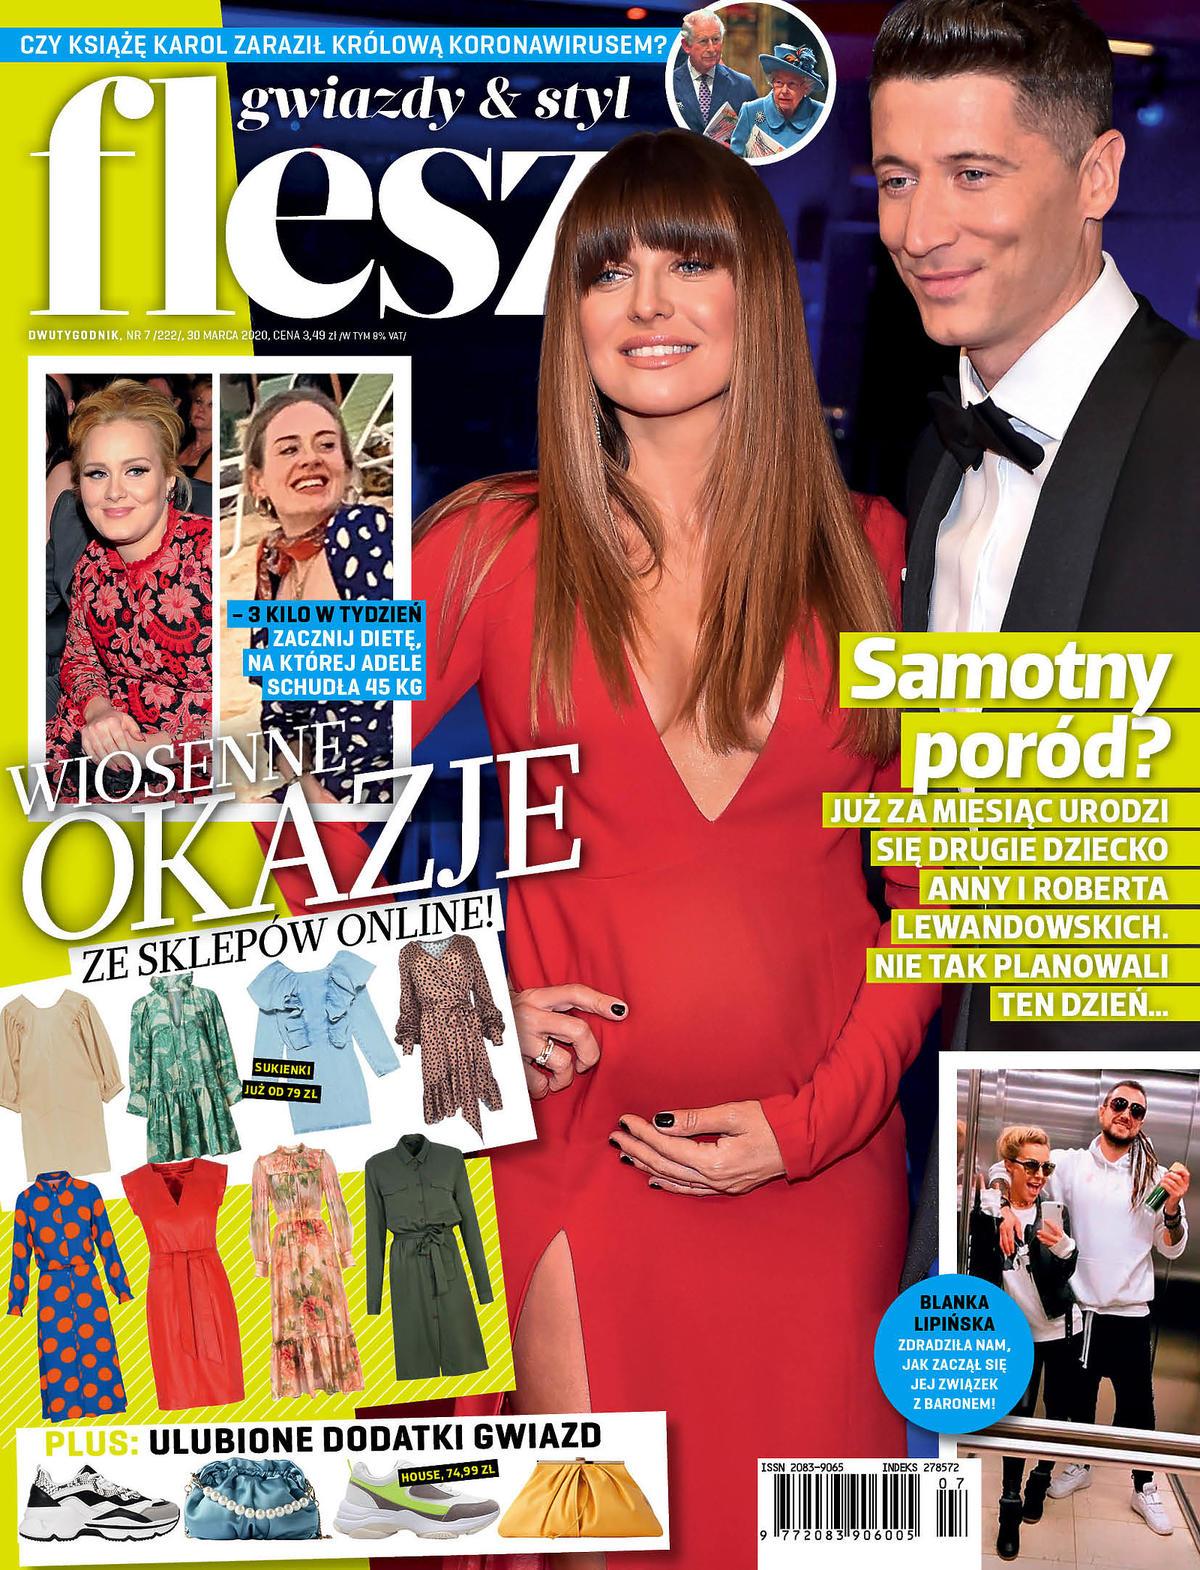 Anna Lewandowska na okładce magazynu